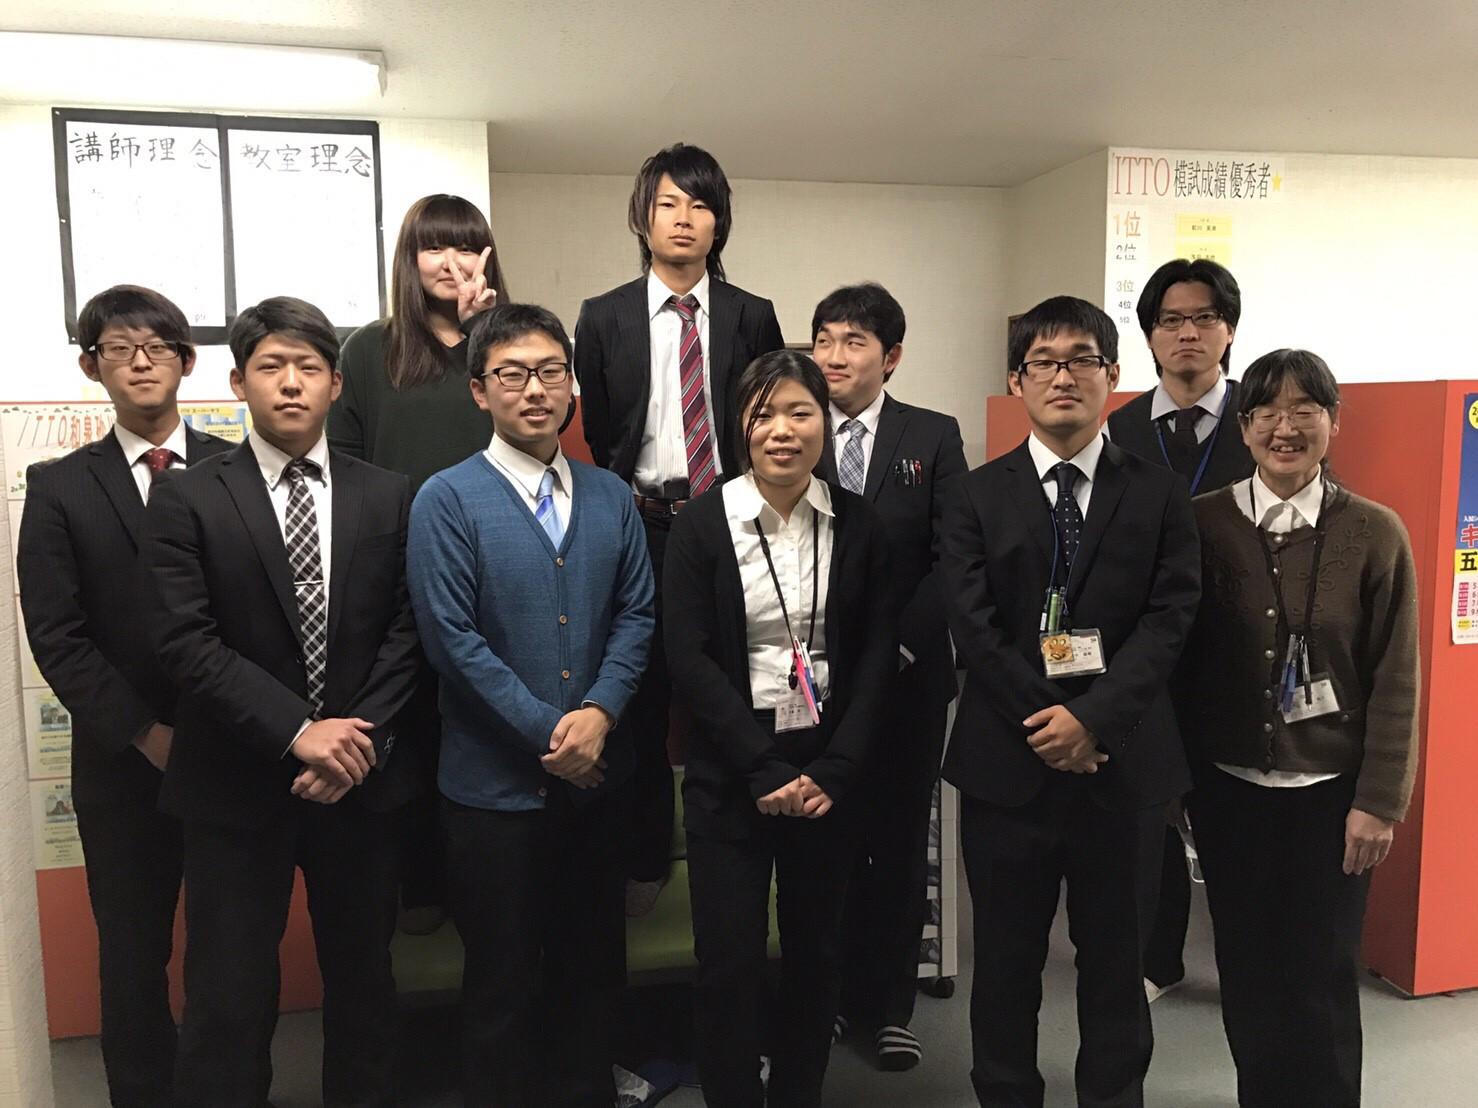 ITTO個別指導学院 和泉砂川校のアルバイト情報